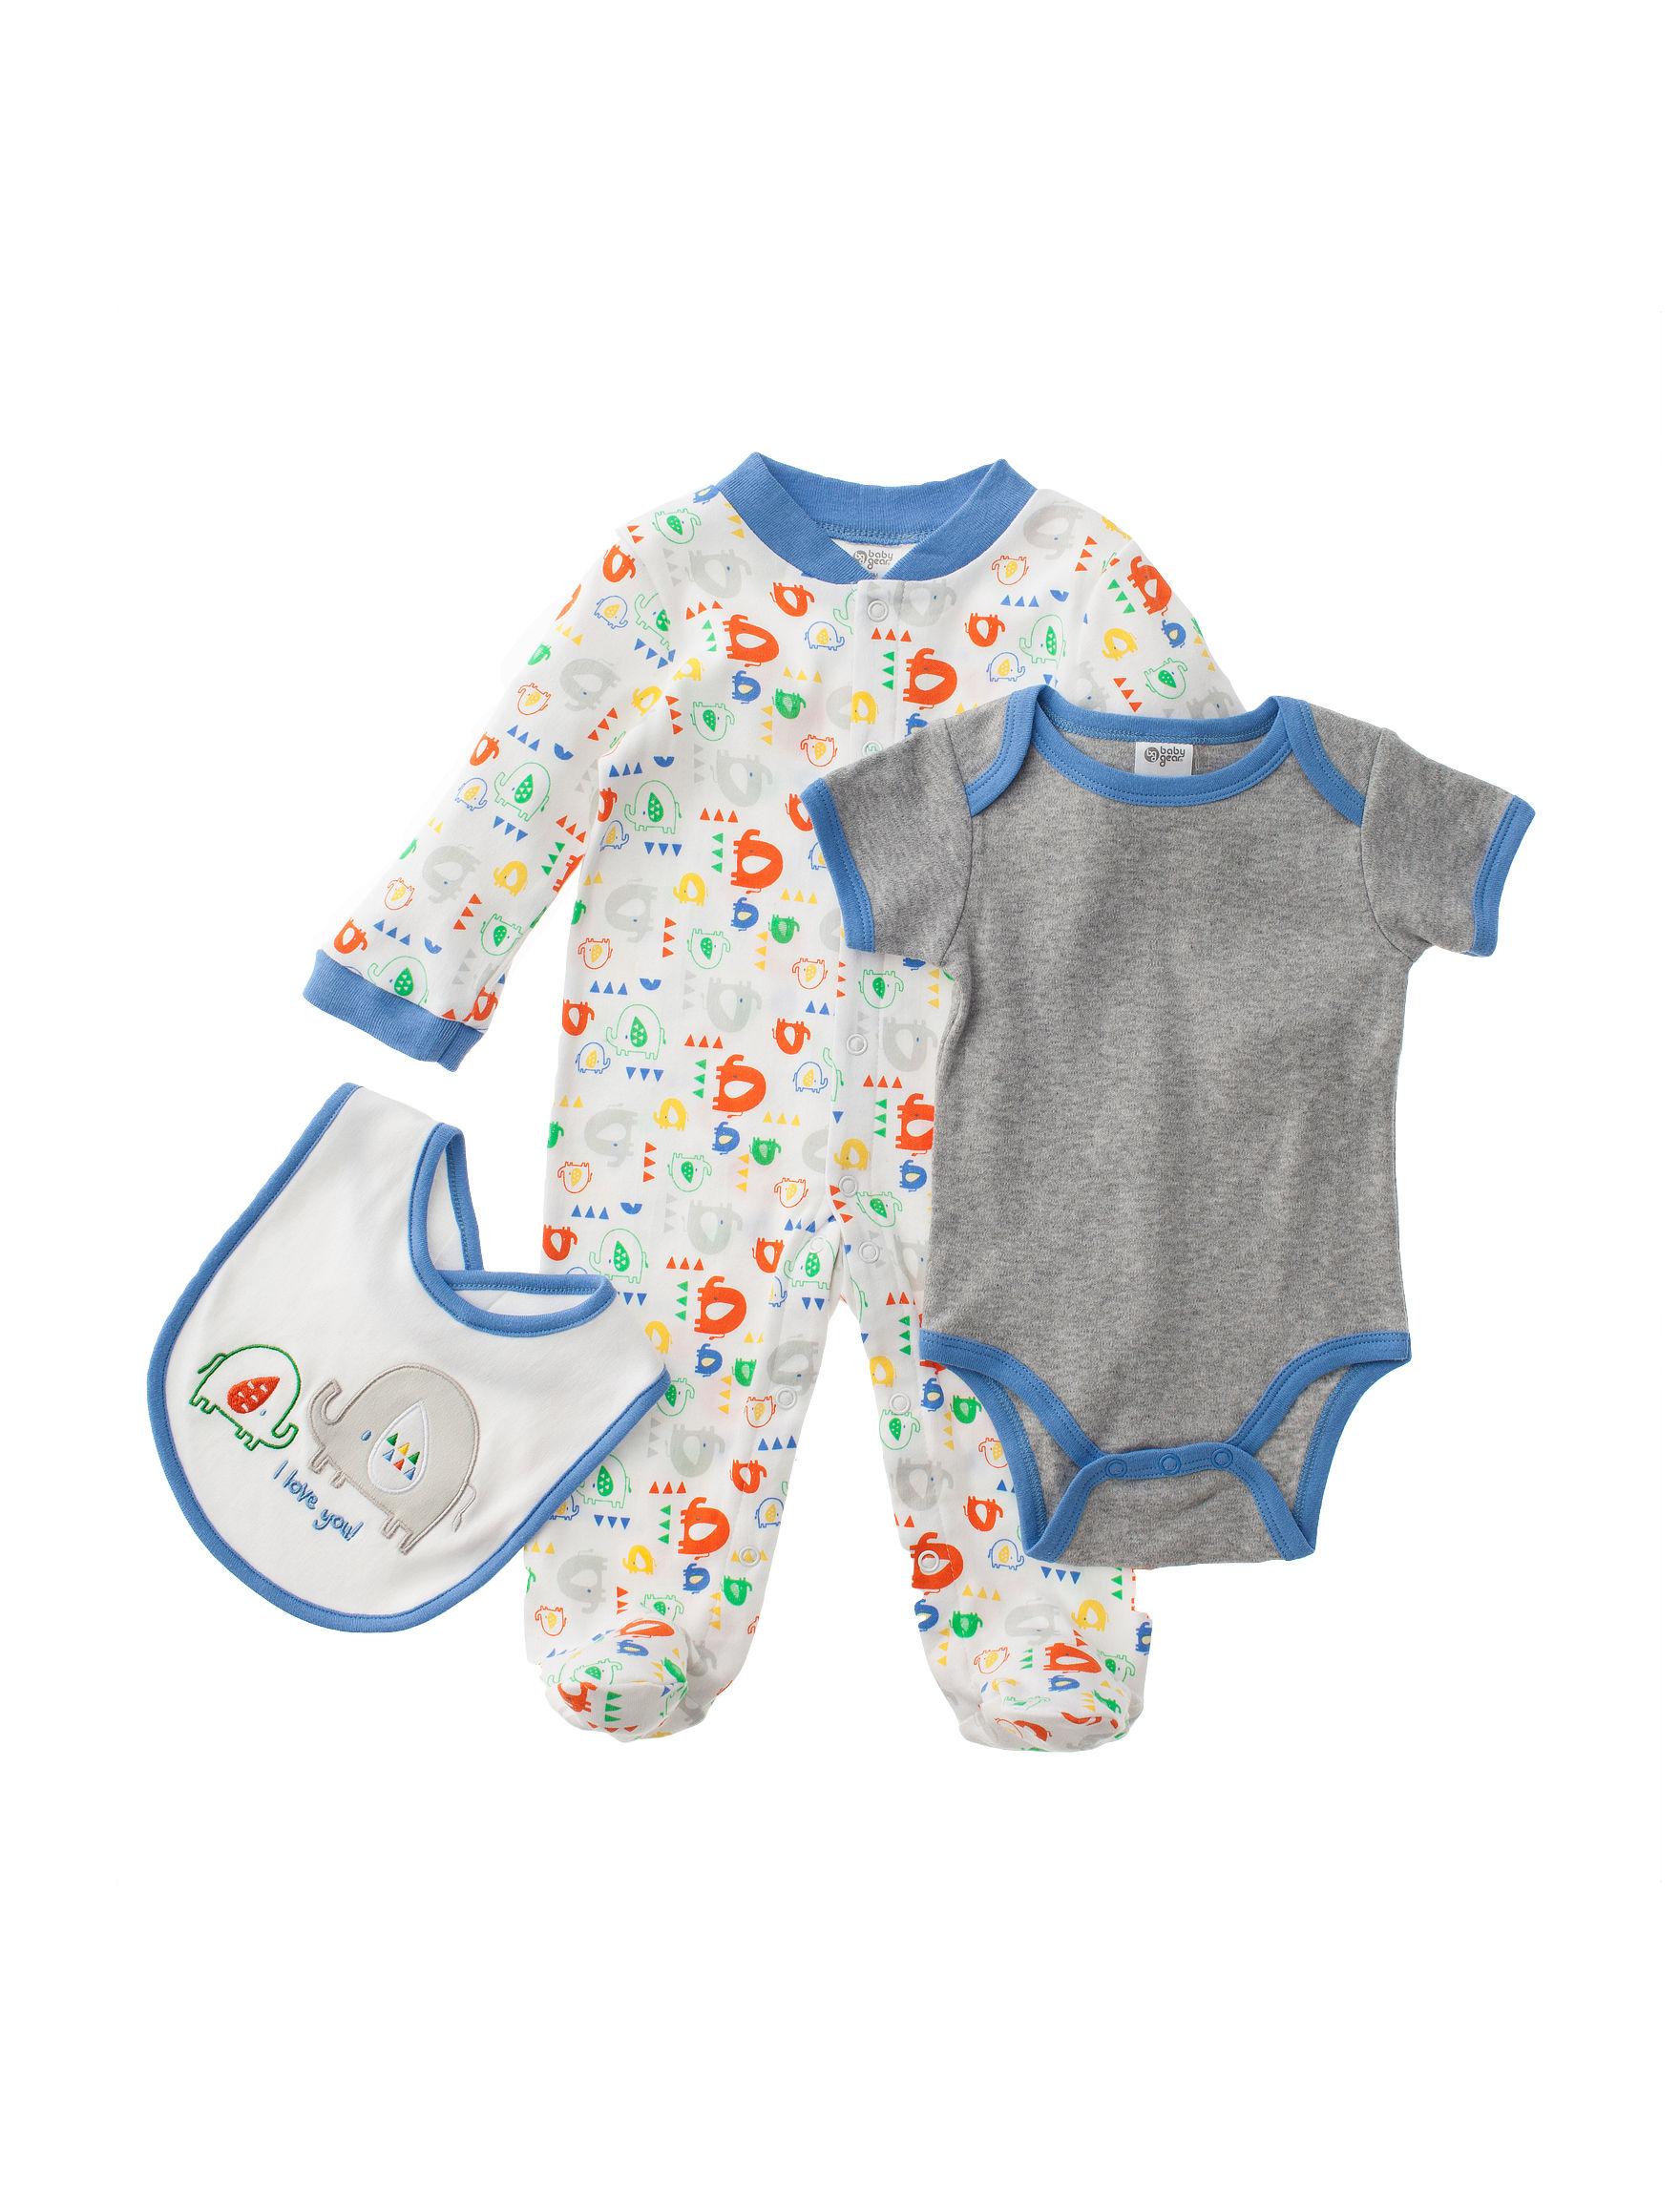 Baby Gear Gray